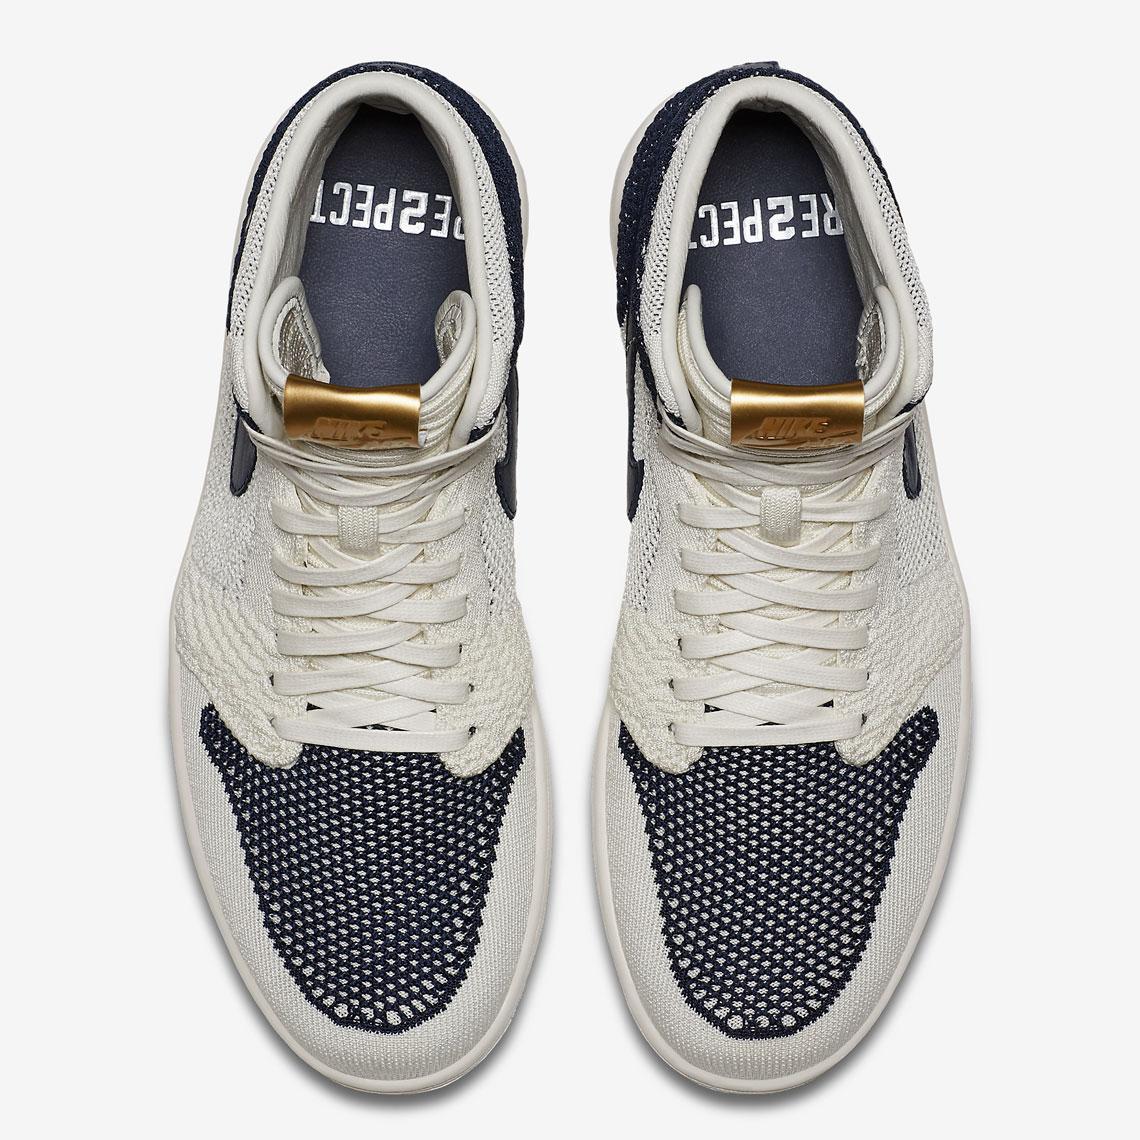 Air Jordan 1 Flyknit RE2PECT Coming